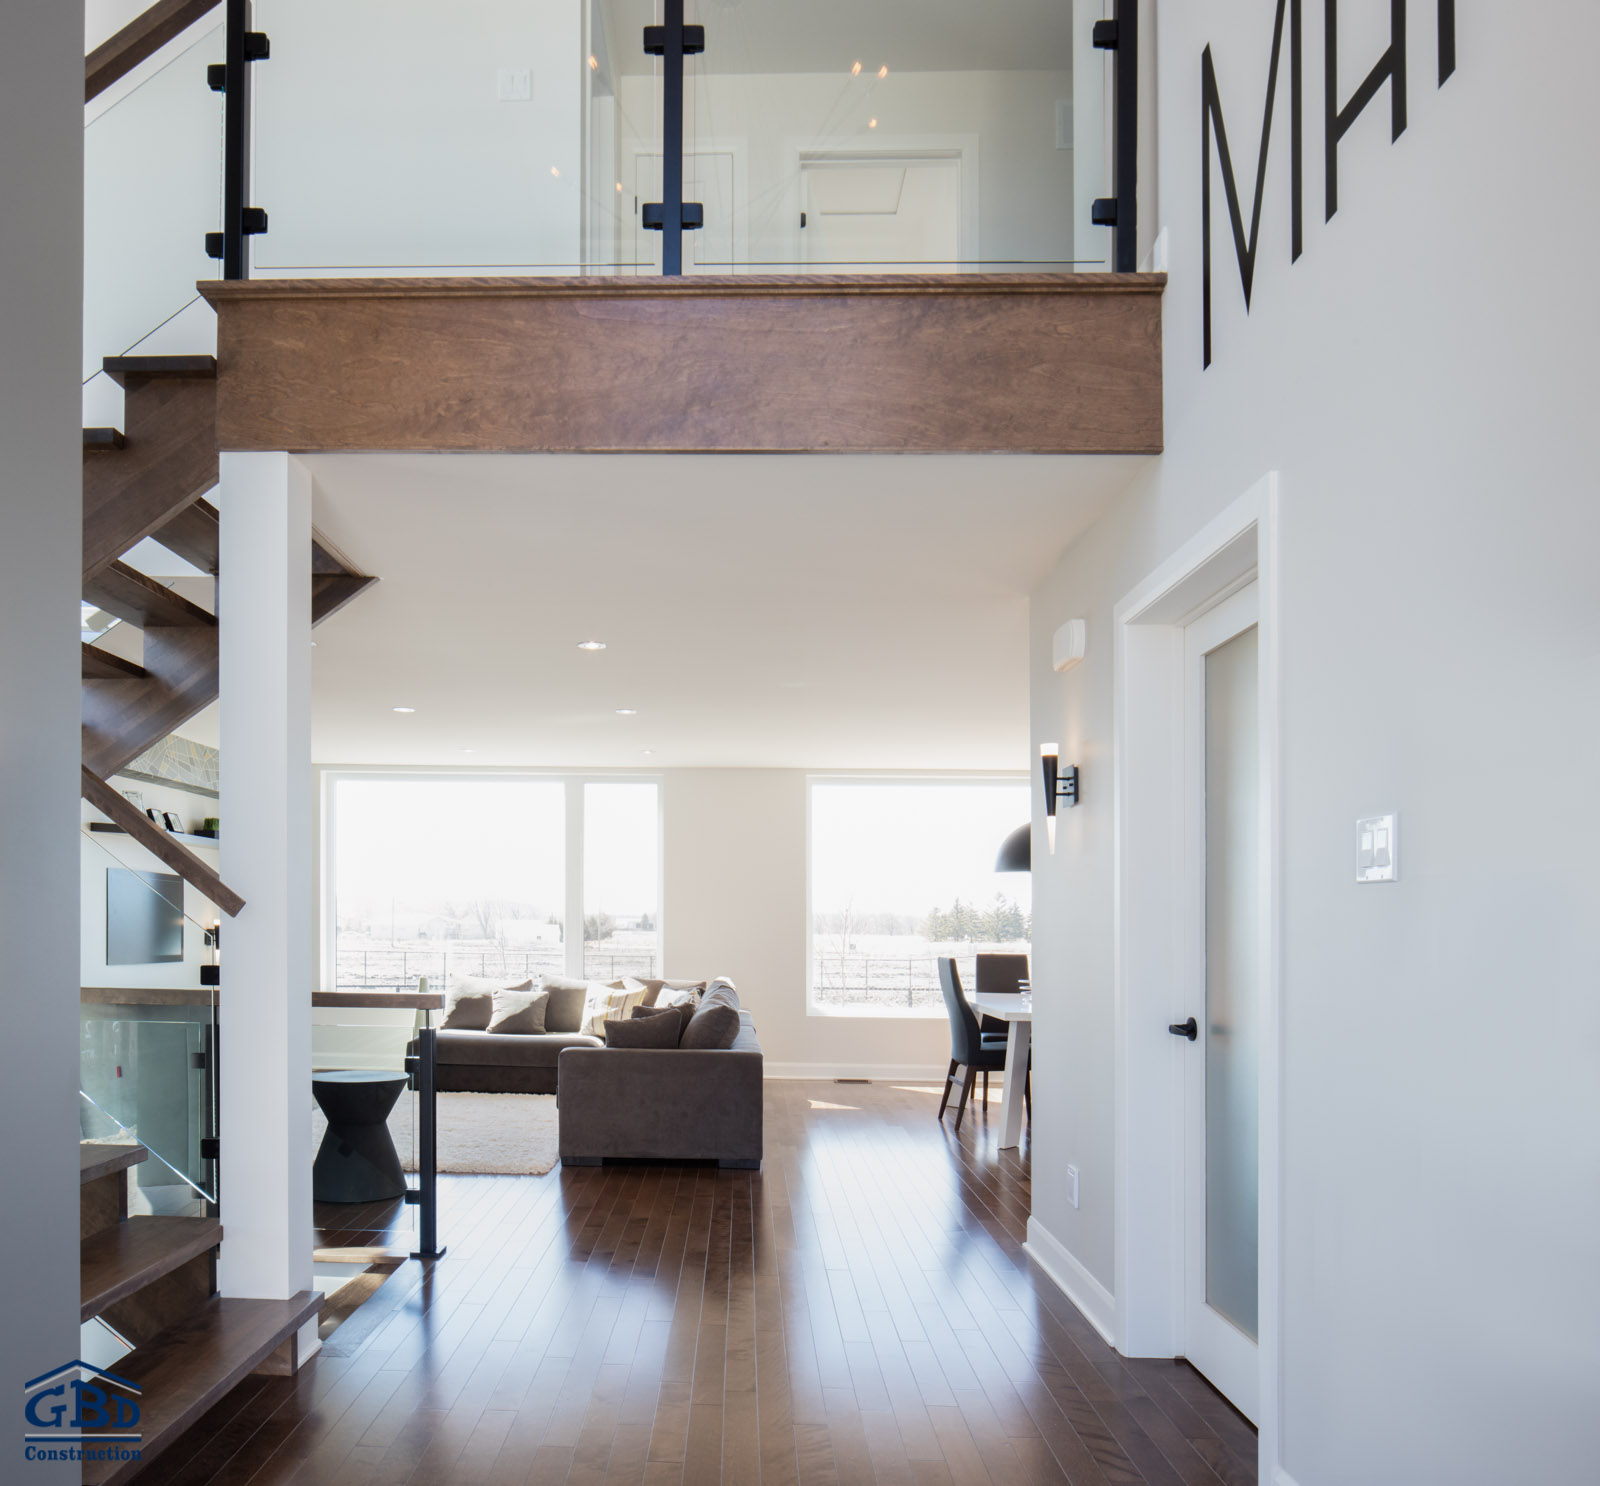 Maison neuve rive nord modele manhattan 09 for Construction maison neuve rive nord